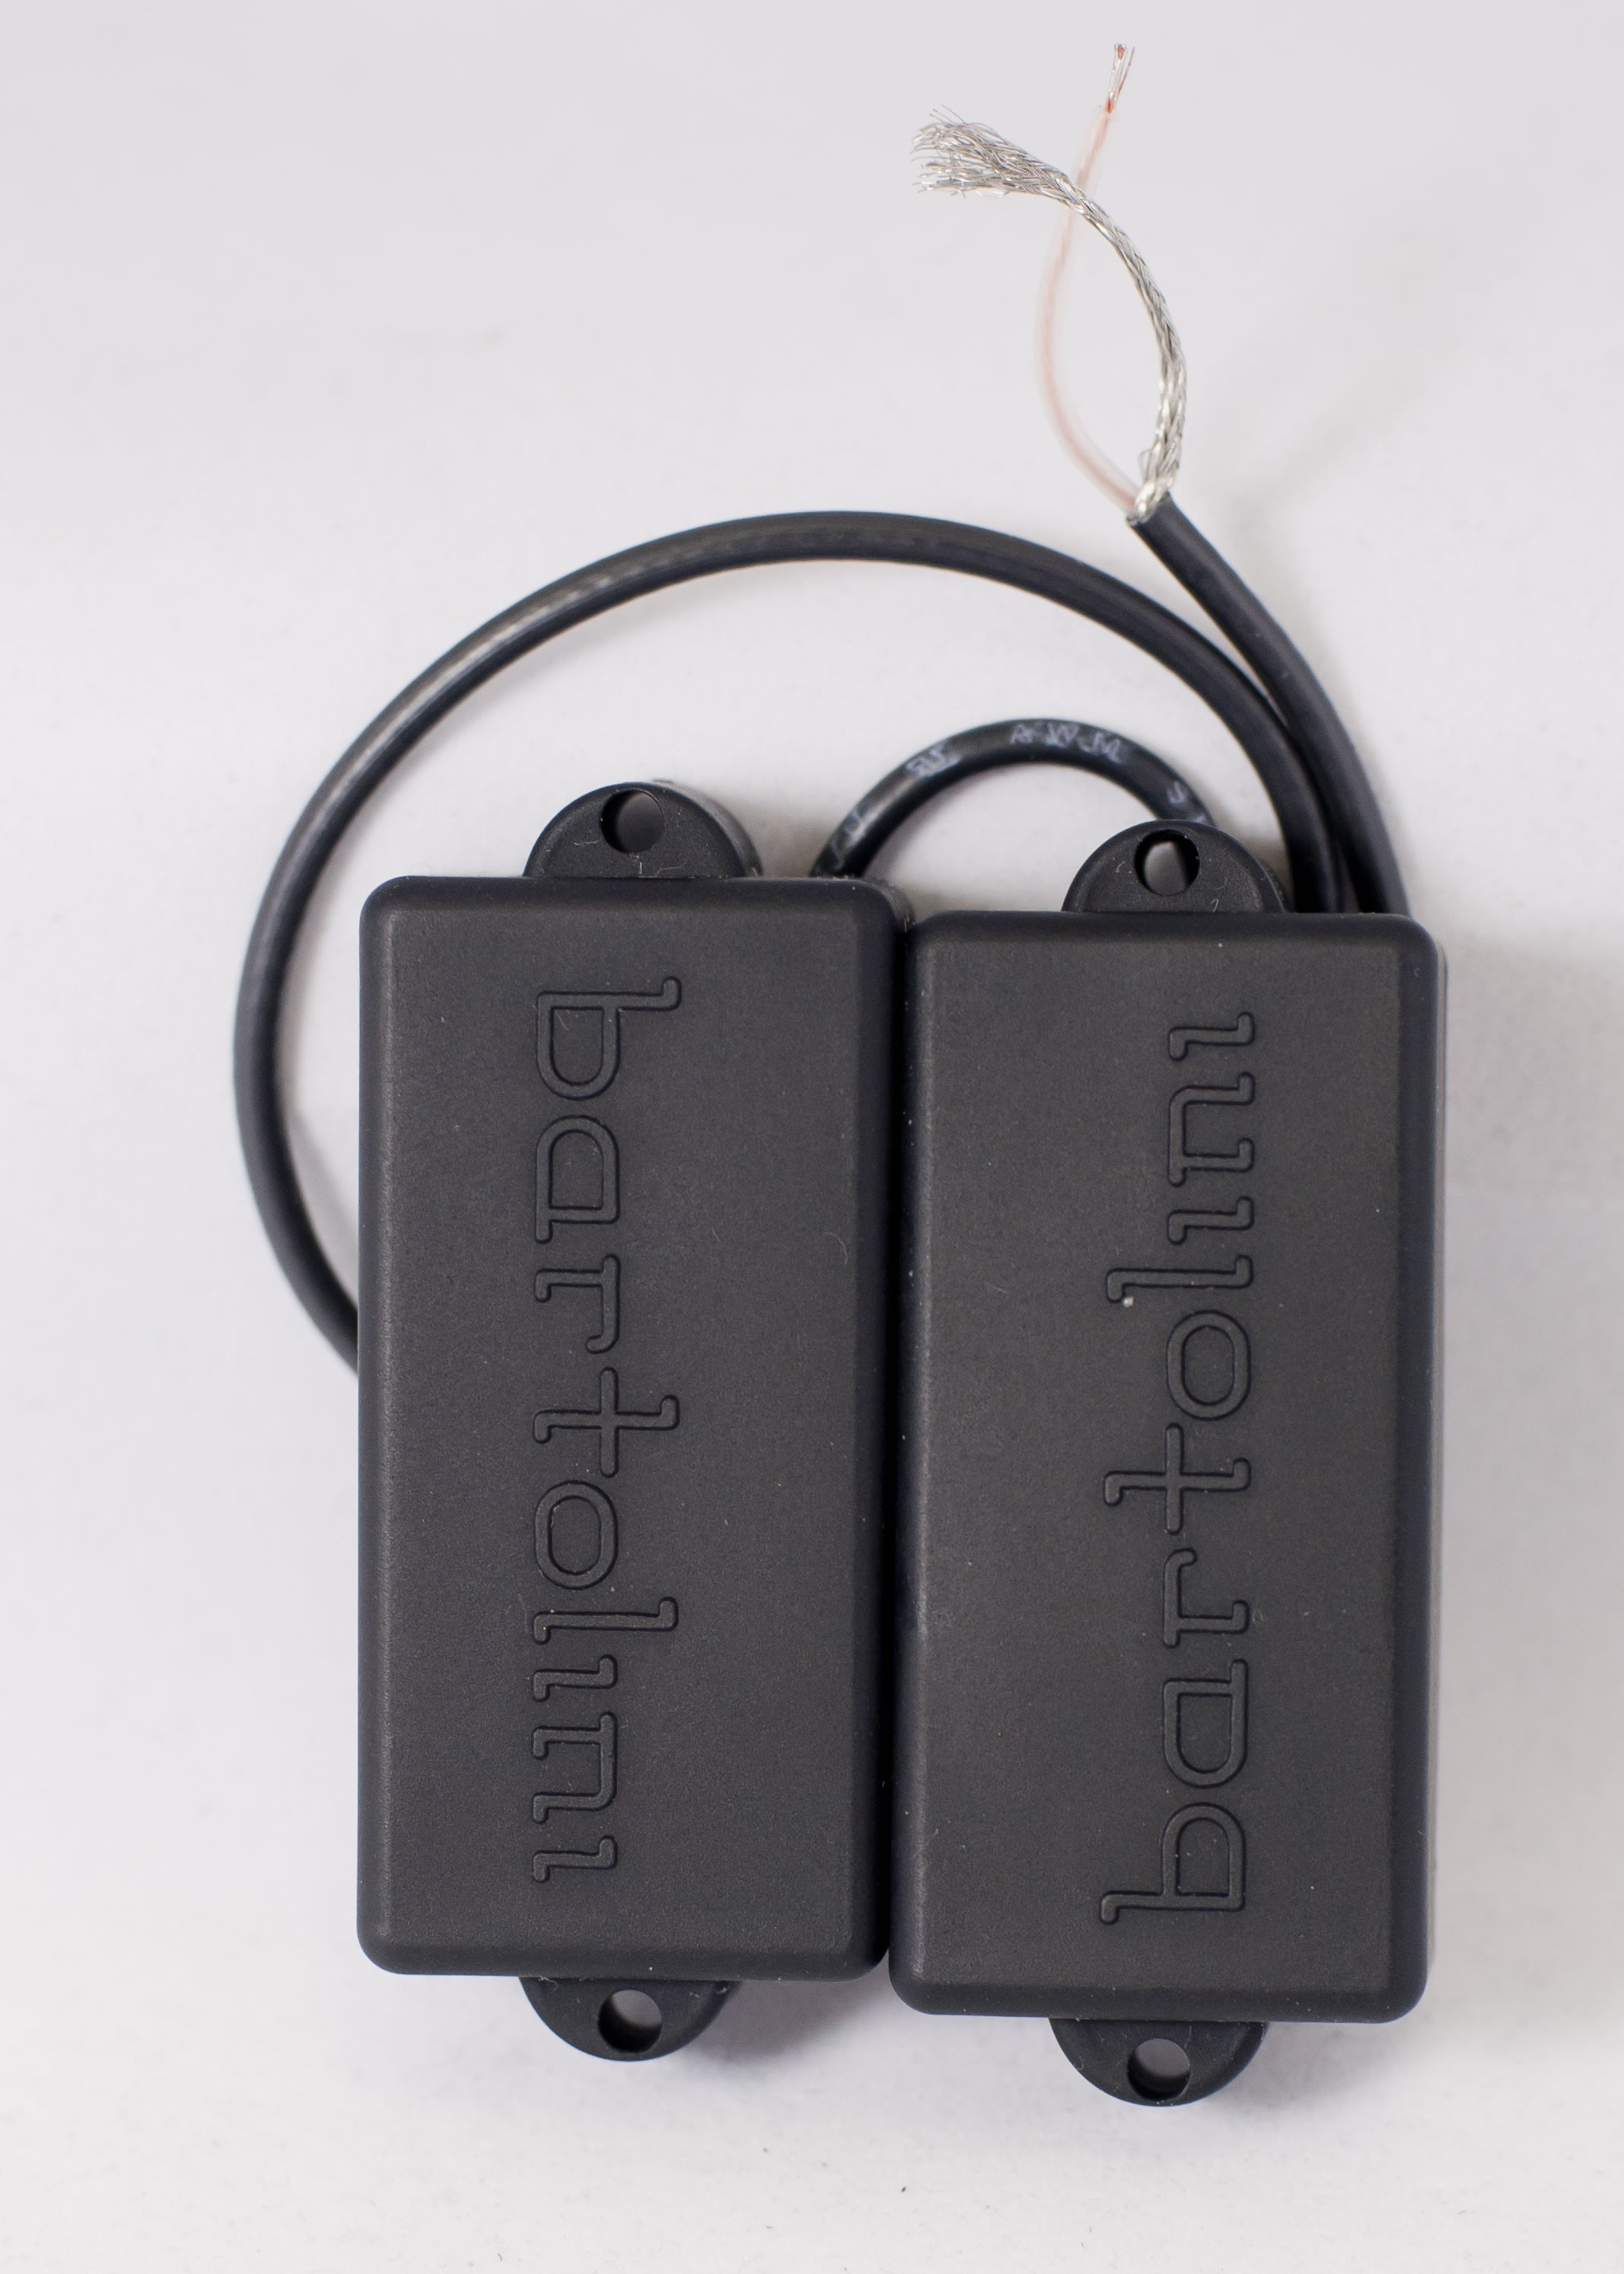 bartolini 8su 4 string p bass pickup deep tone used for pj sets best bass gear. Black Bedroom Furniture Sets. Home Design Ideas